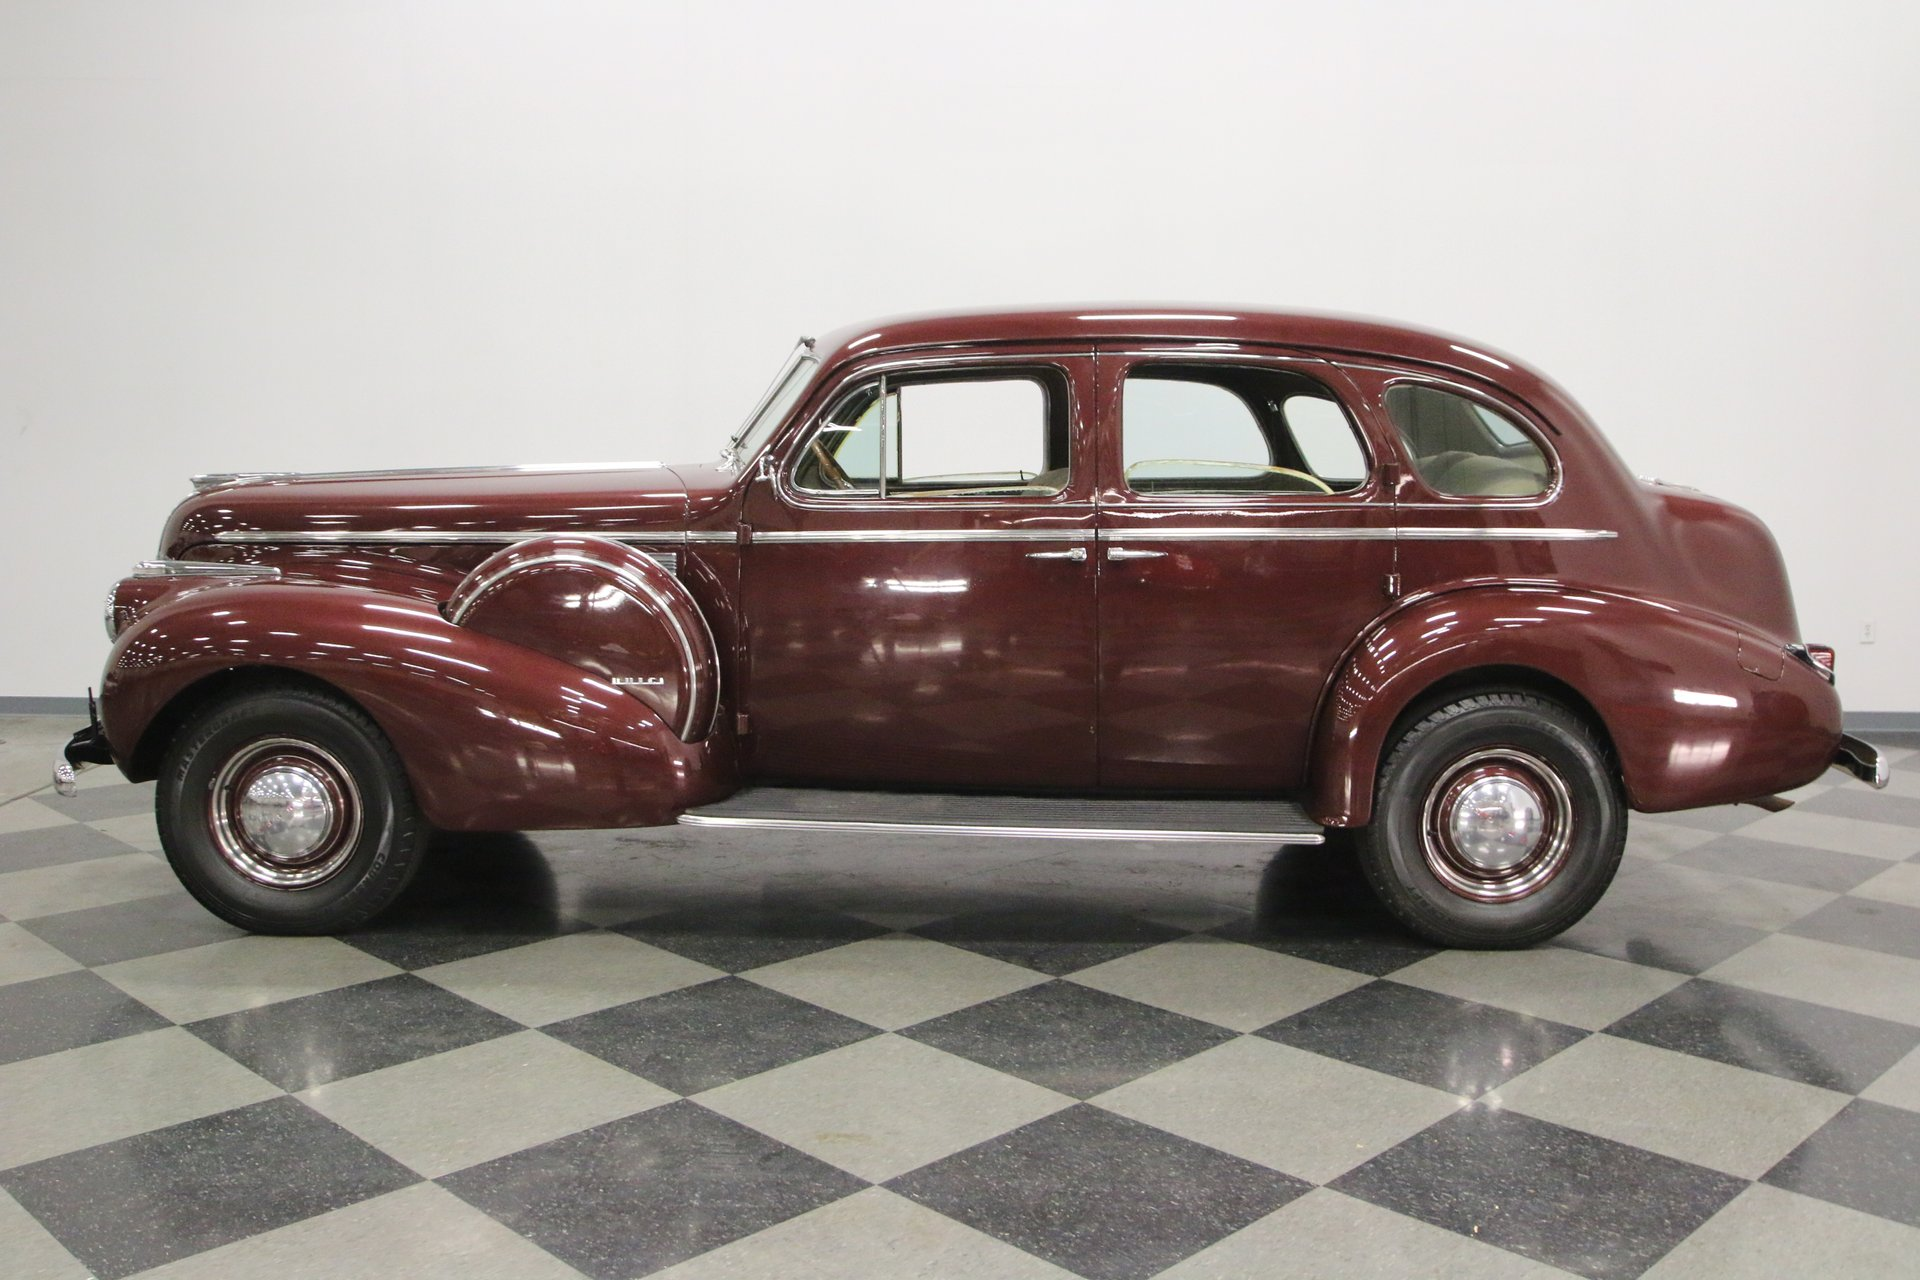 1940 buick series 80 limited formal sedan